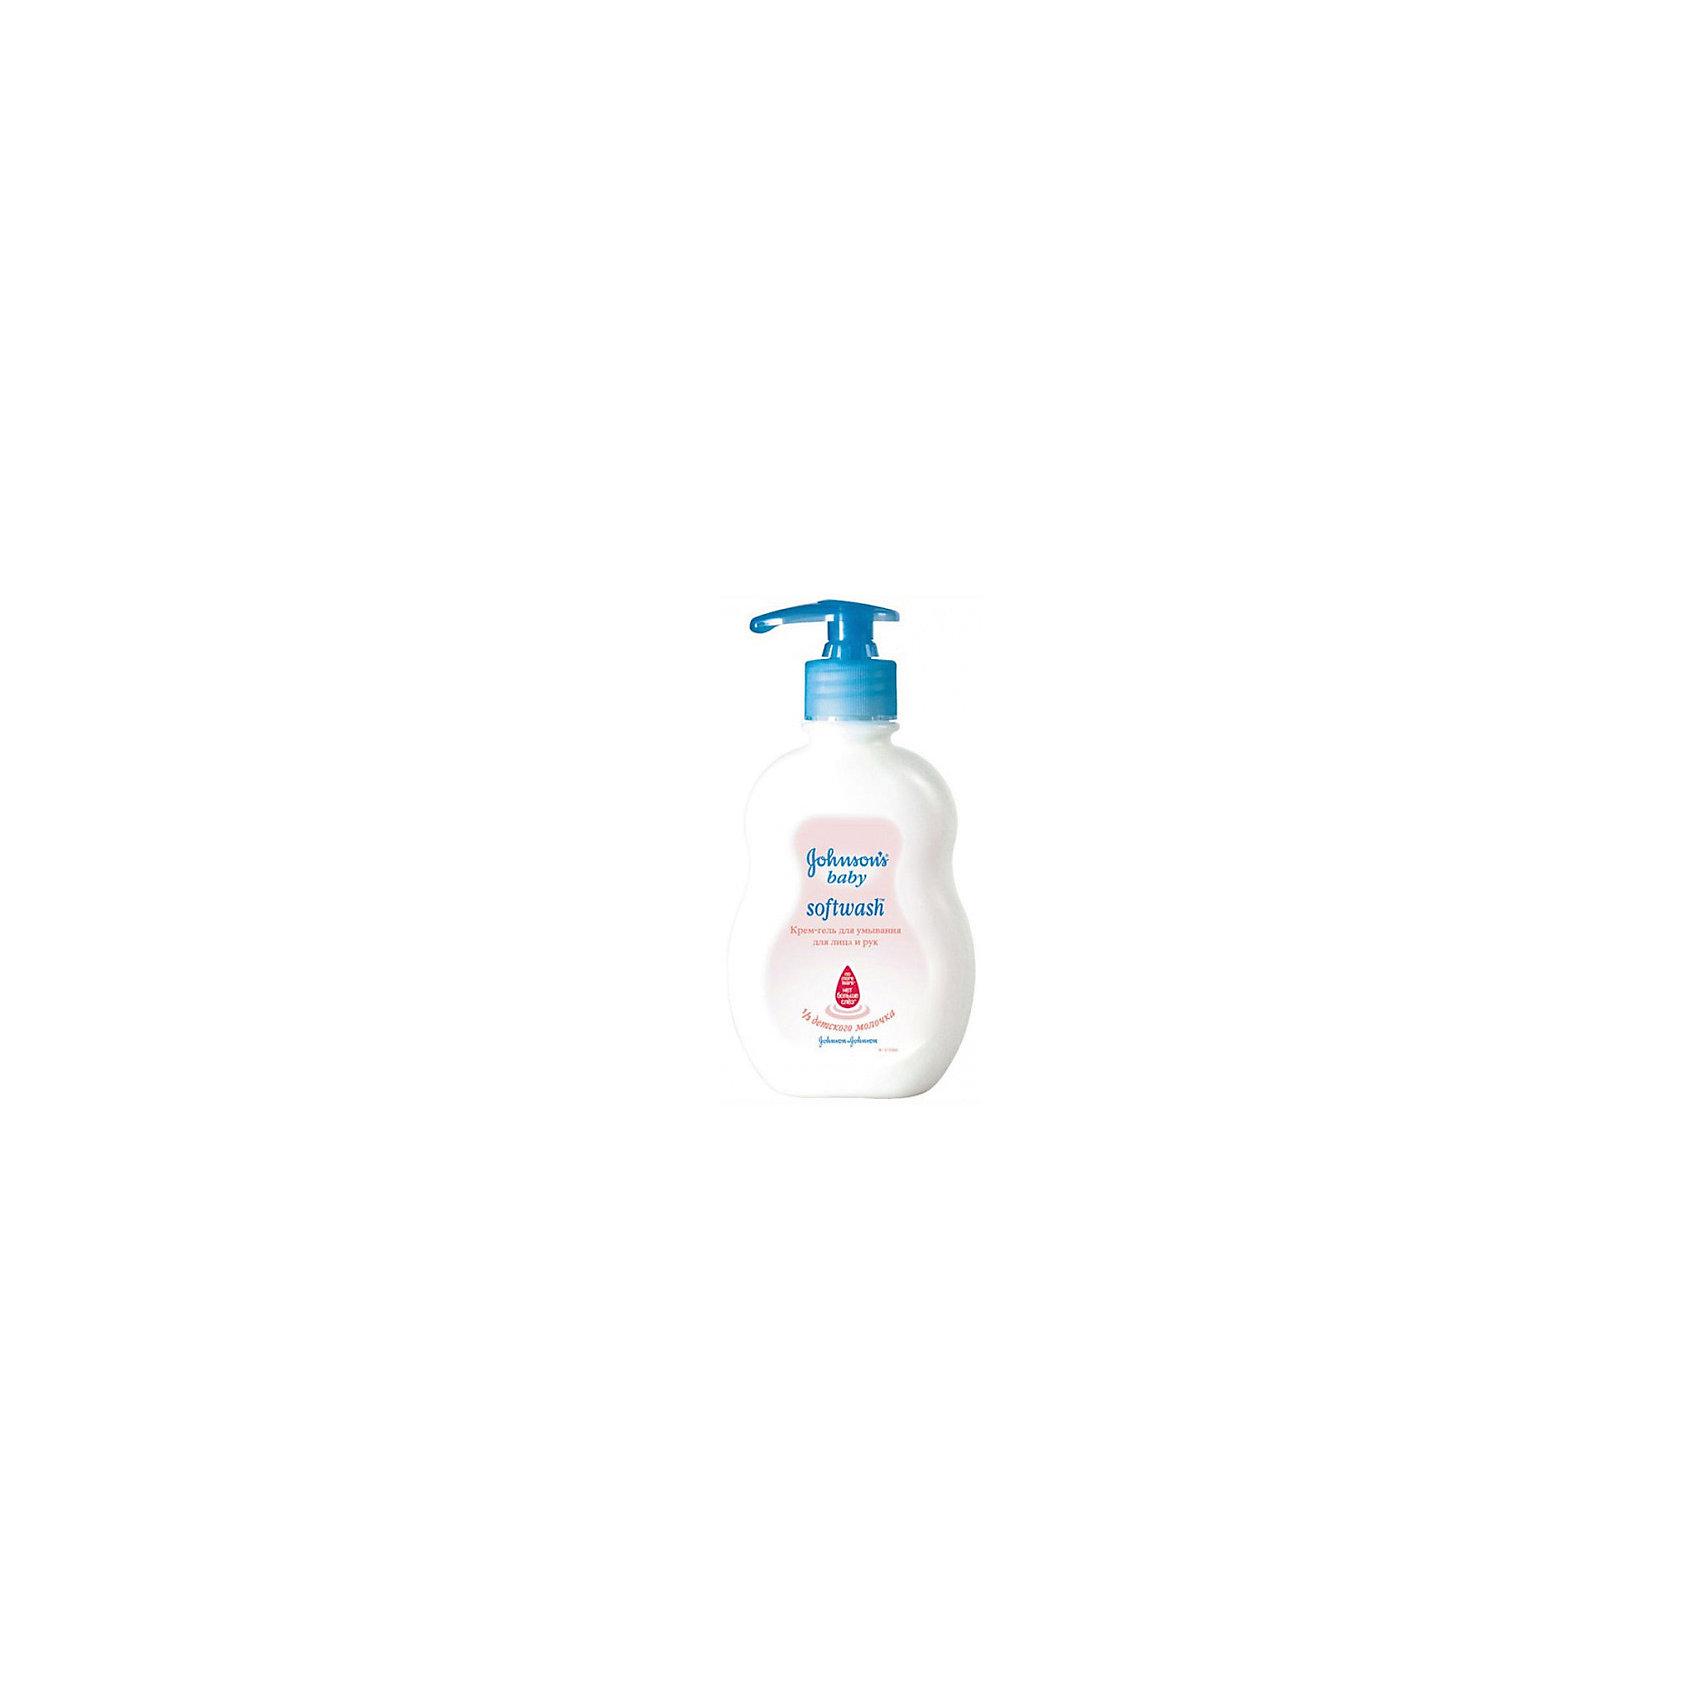 Крем-мыло для лица и рук 300 мл., Johnson s baby (Johnsons baby)